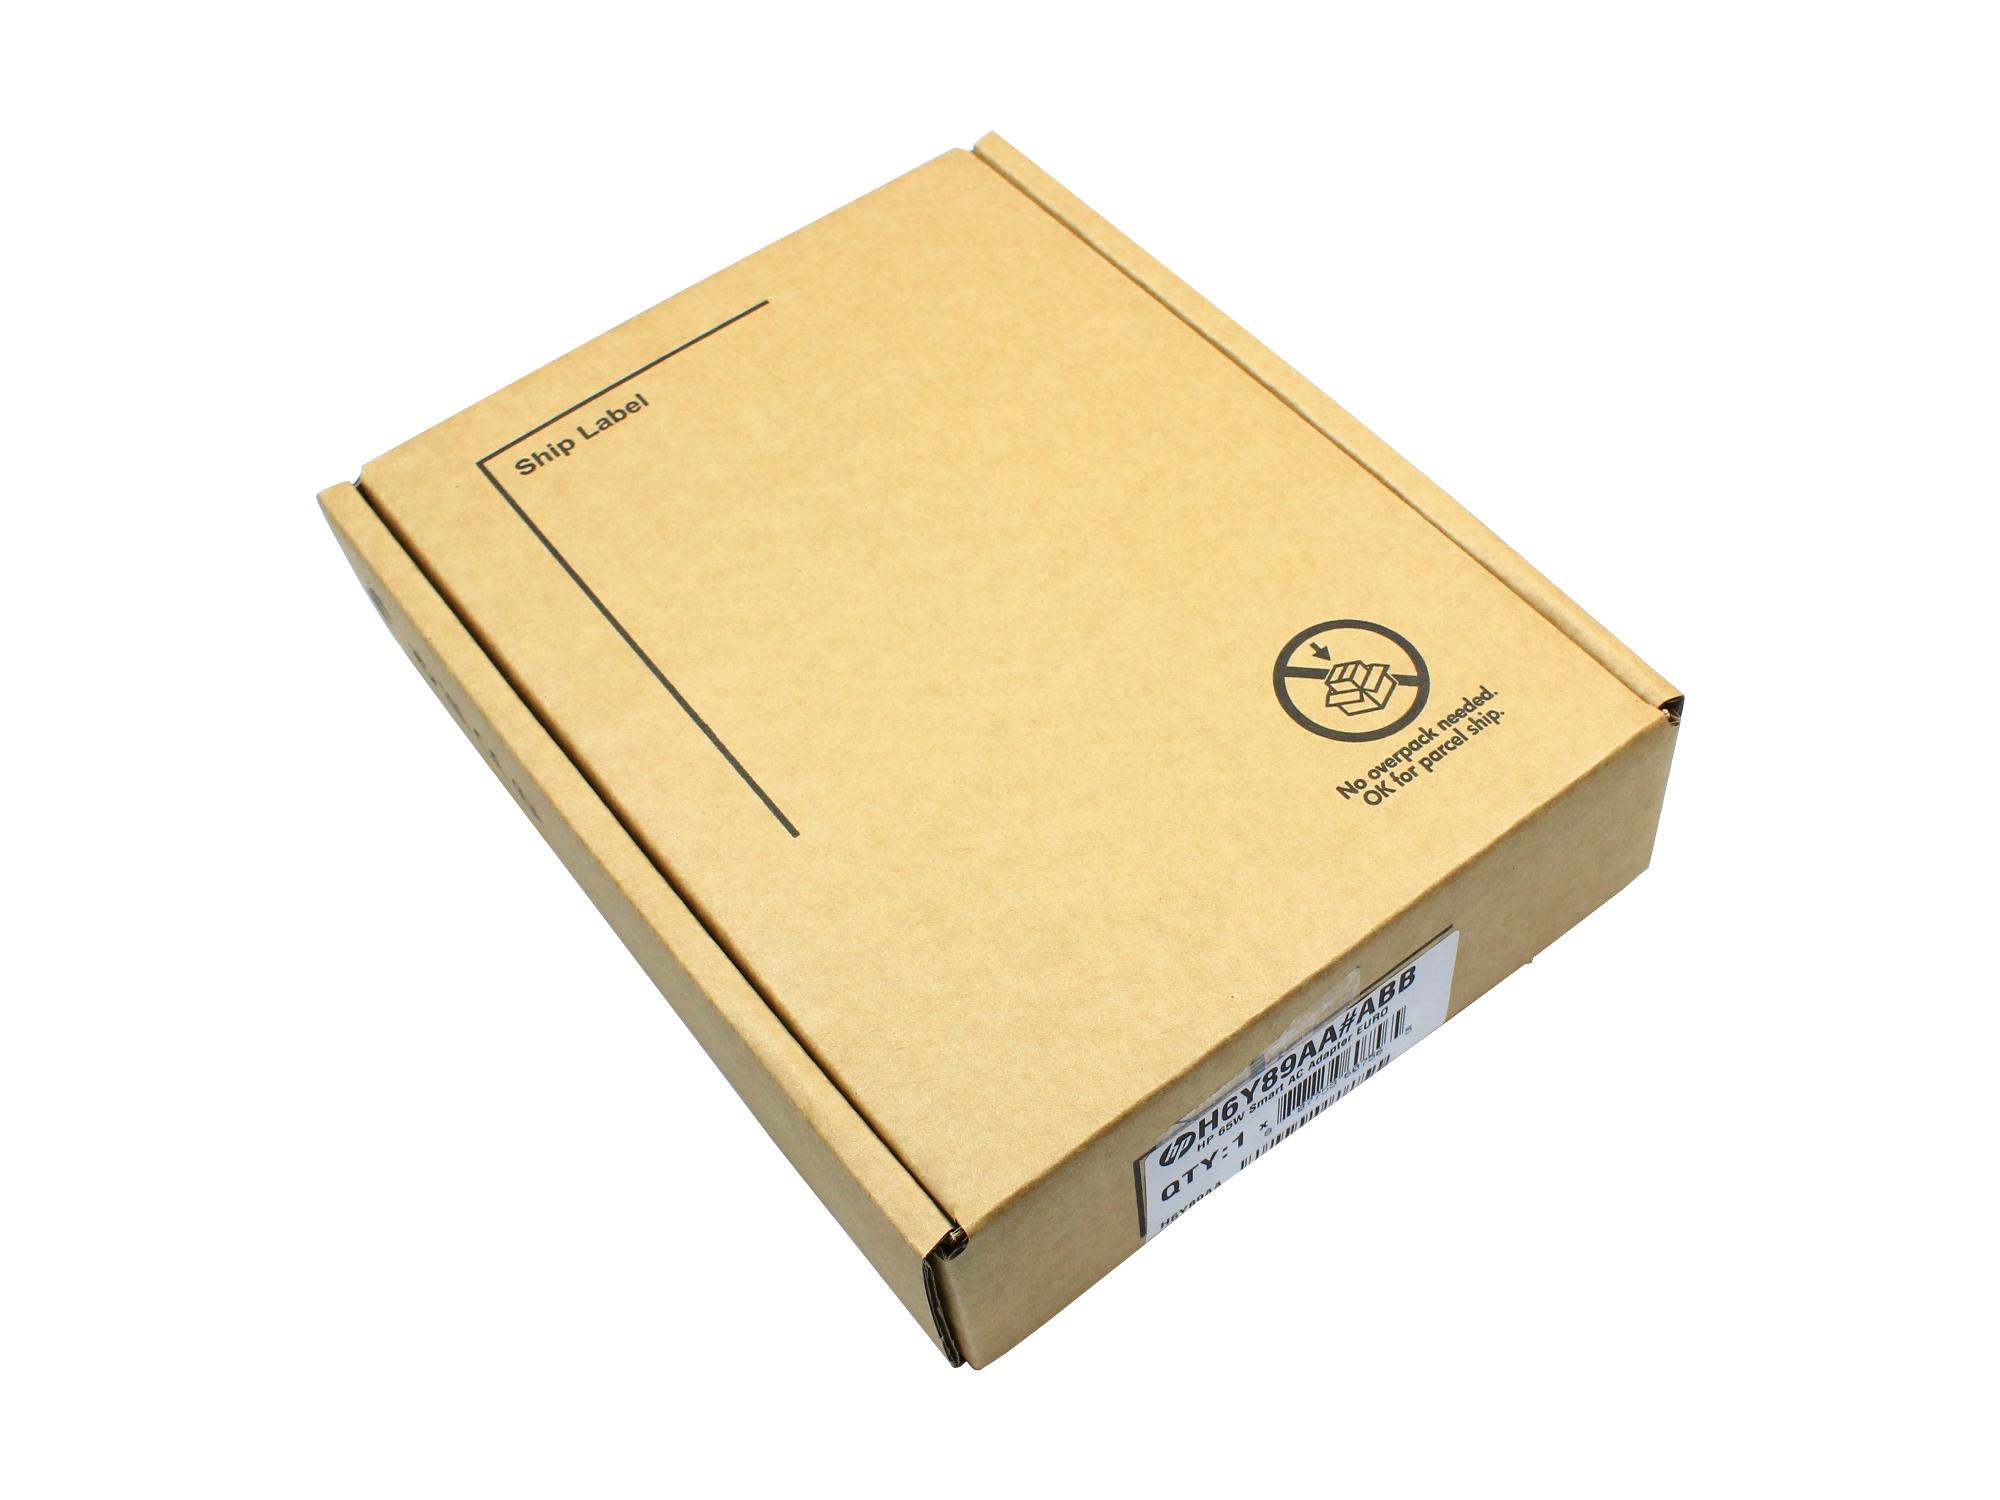 Incarcator original HP ProBook 455 G6, 65W, 4.5mm, pin